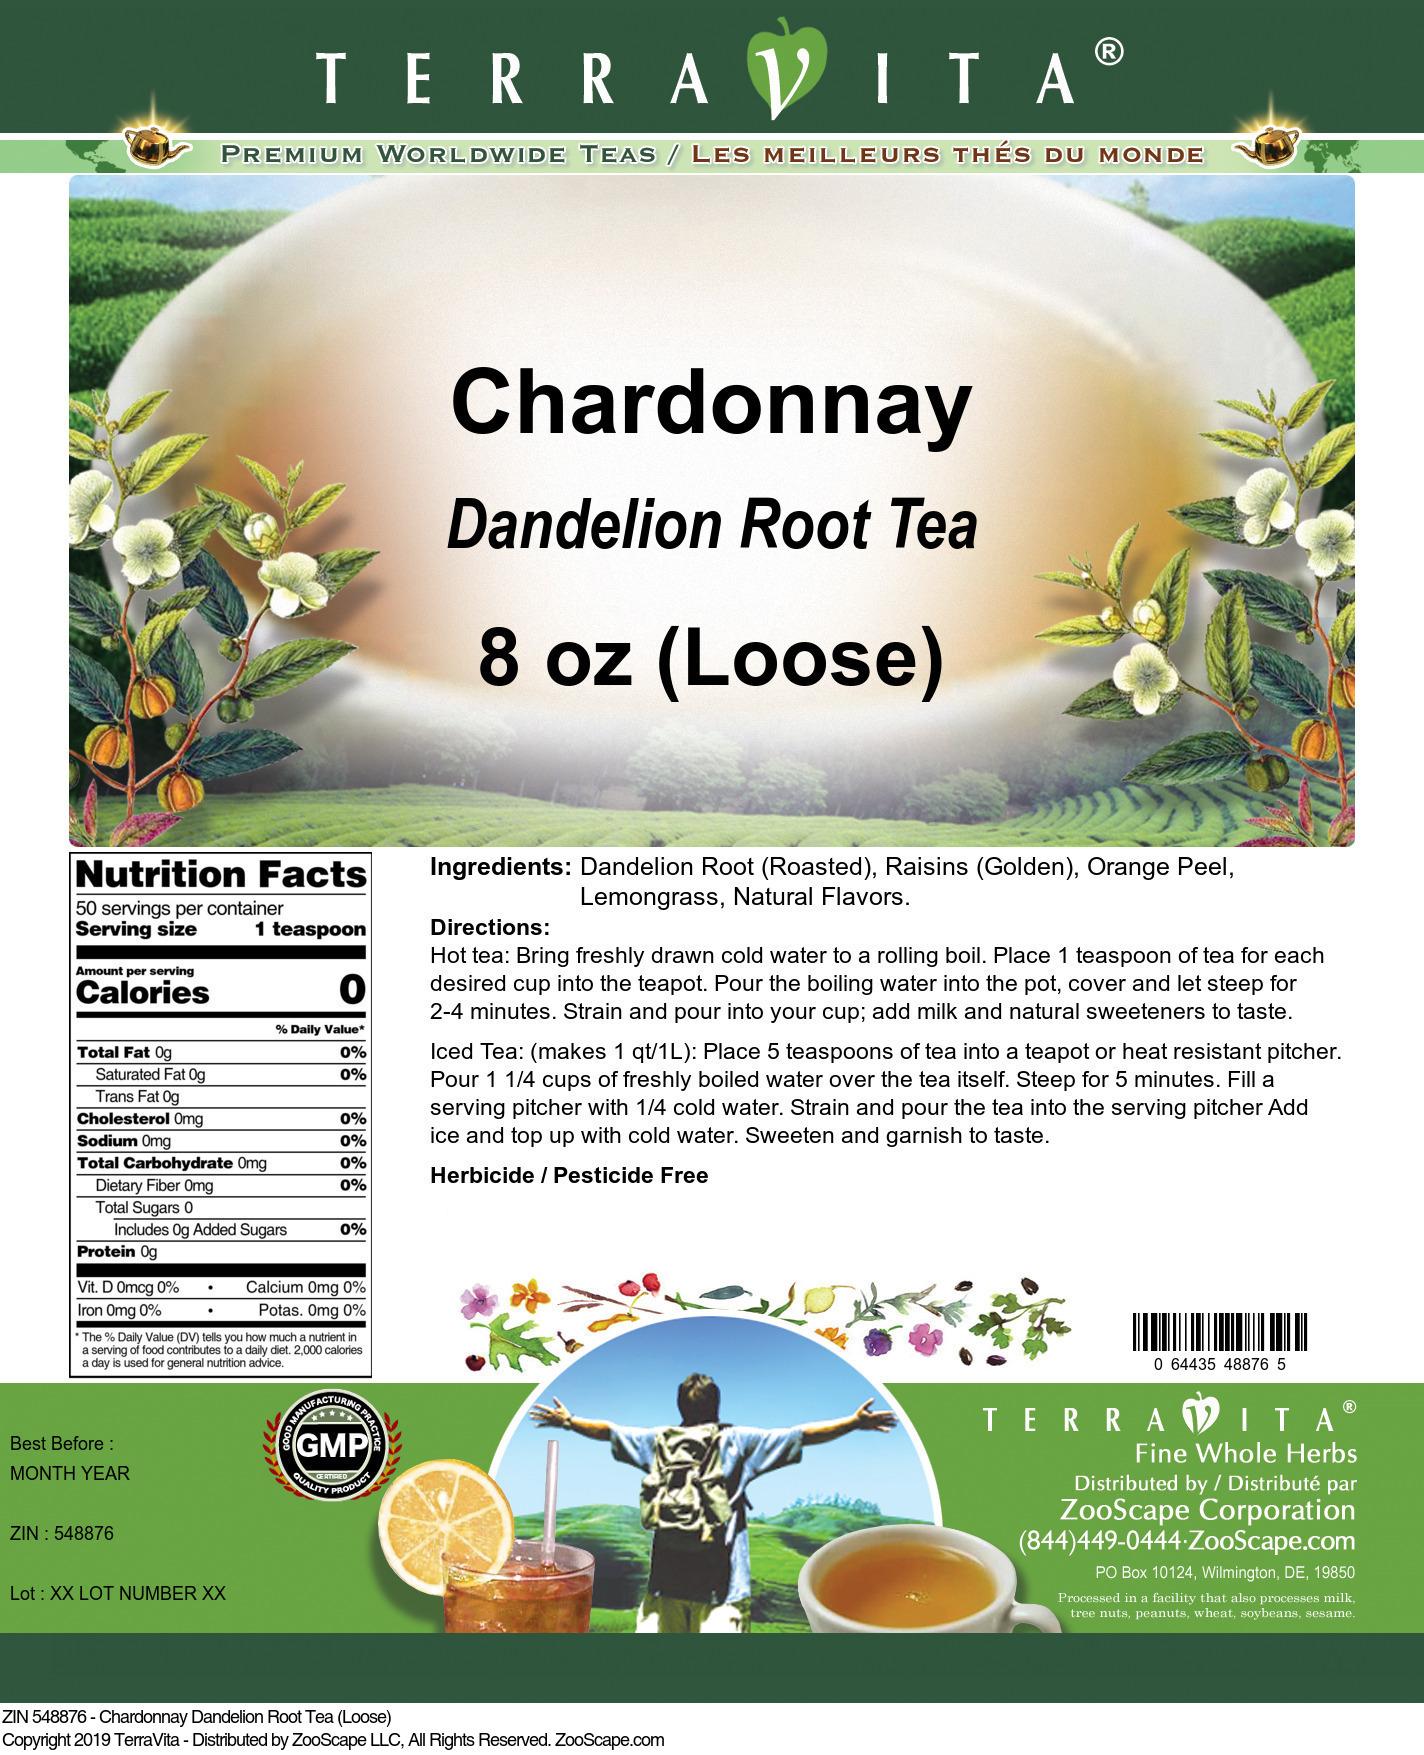 Chardonnay Dandelion Root